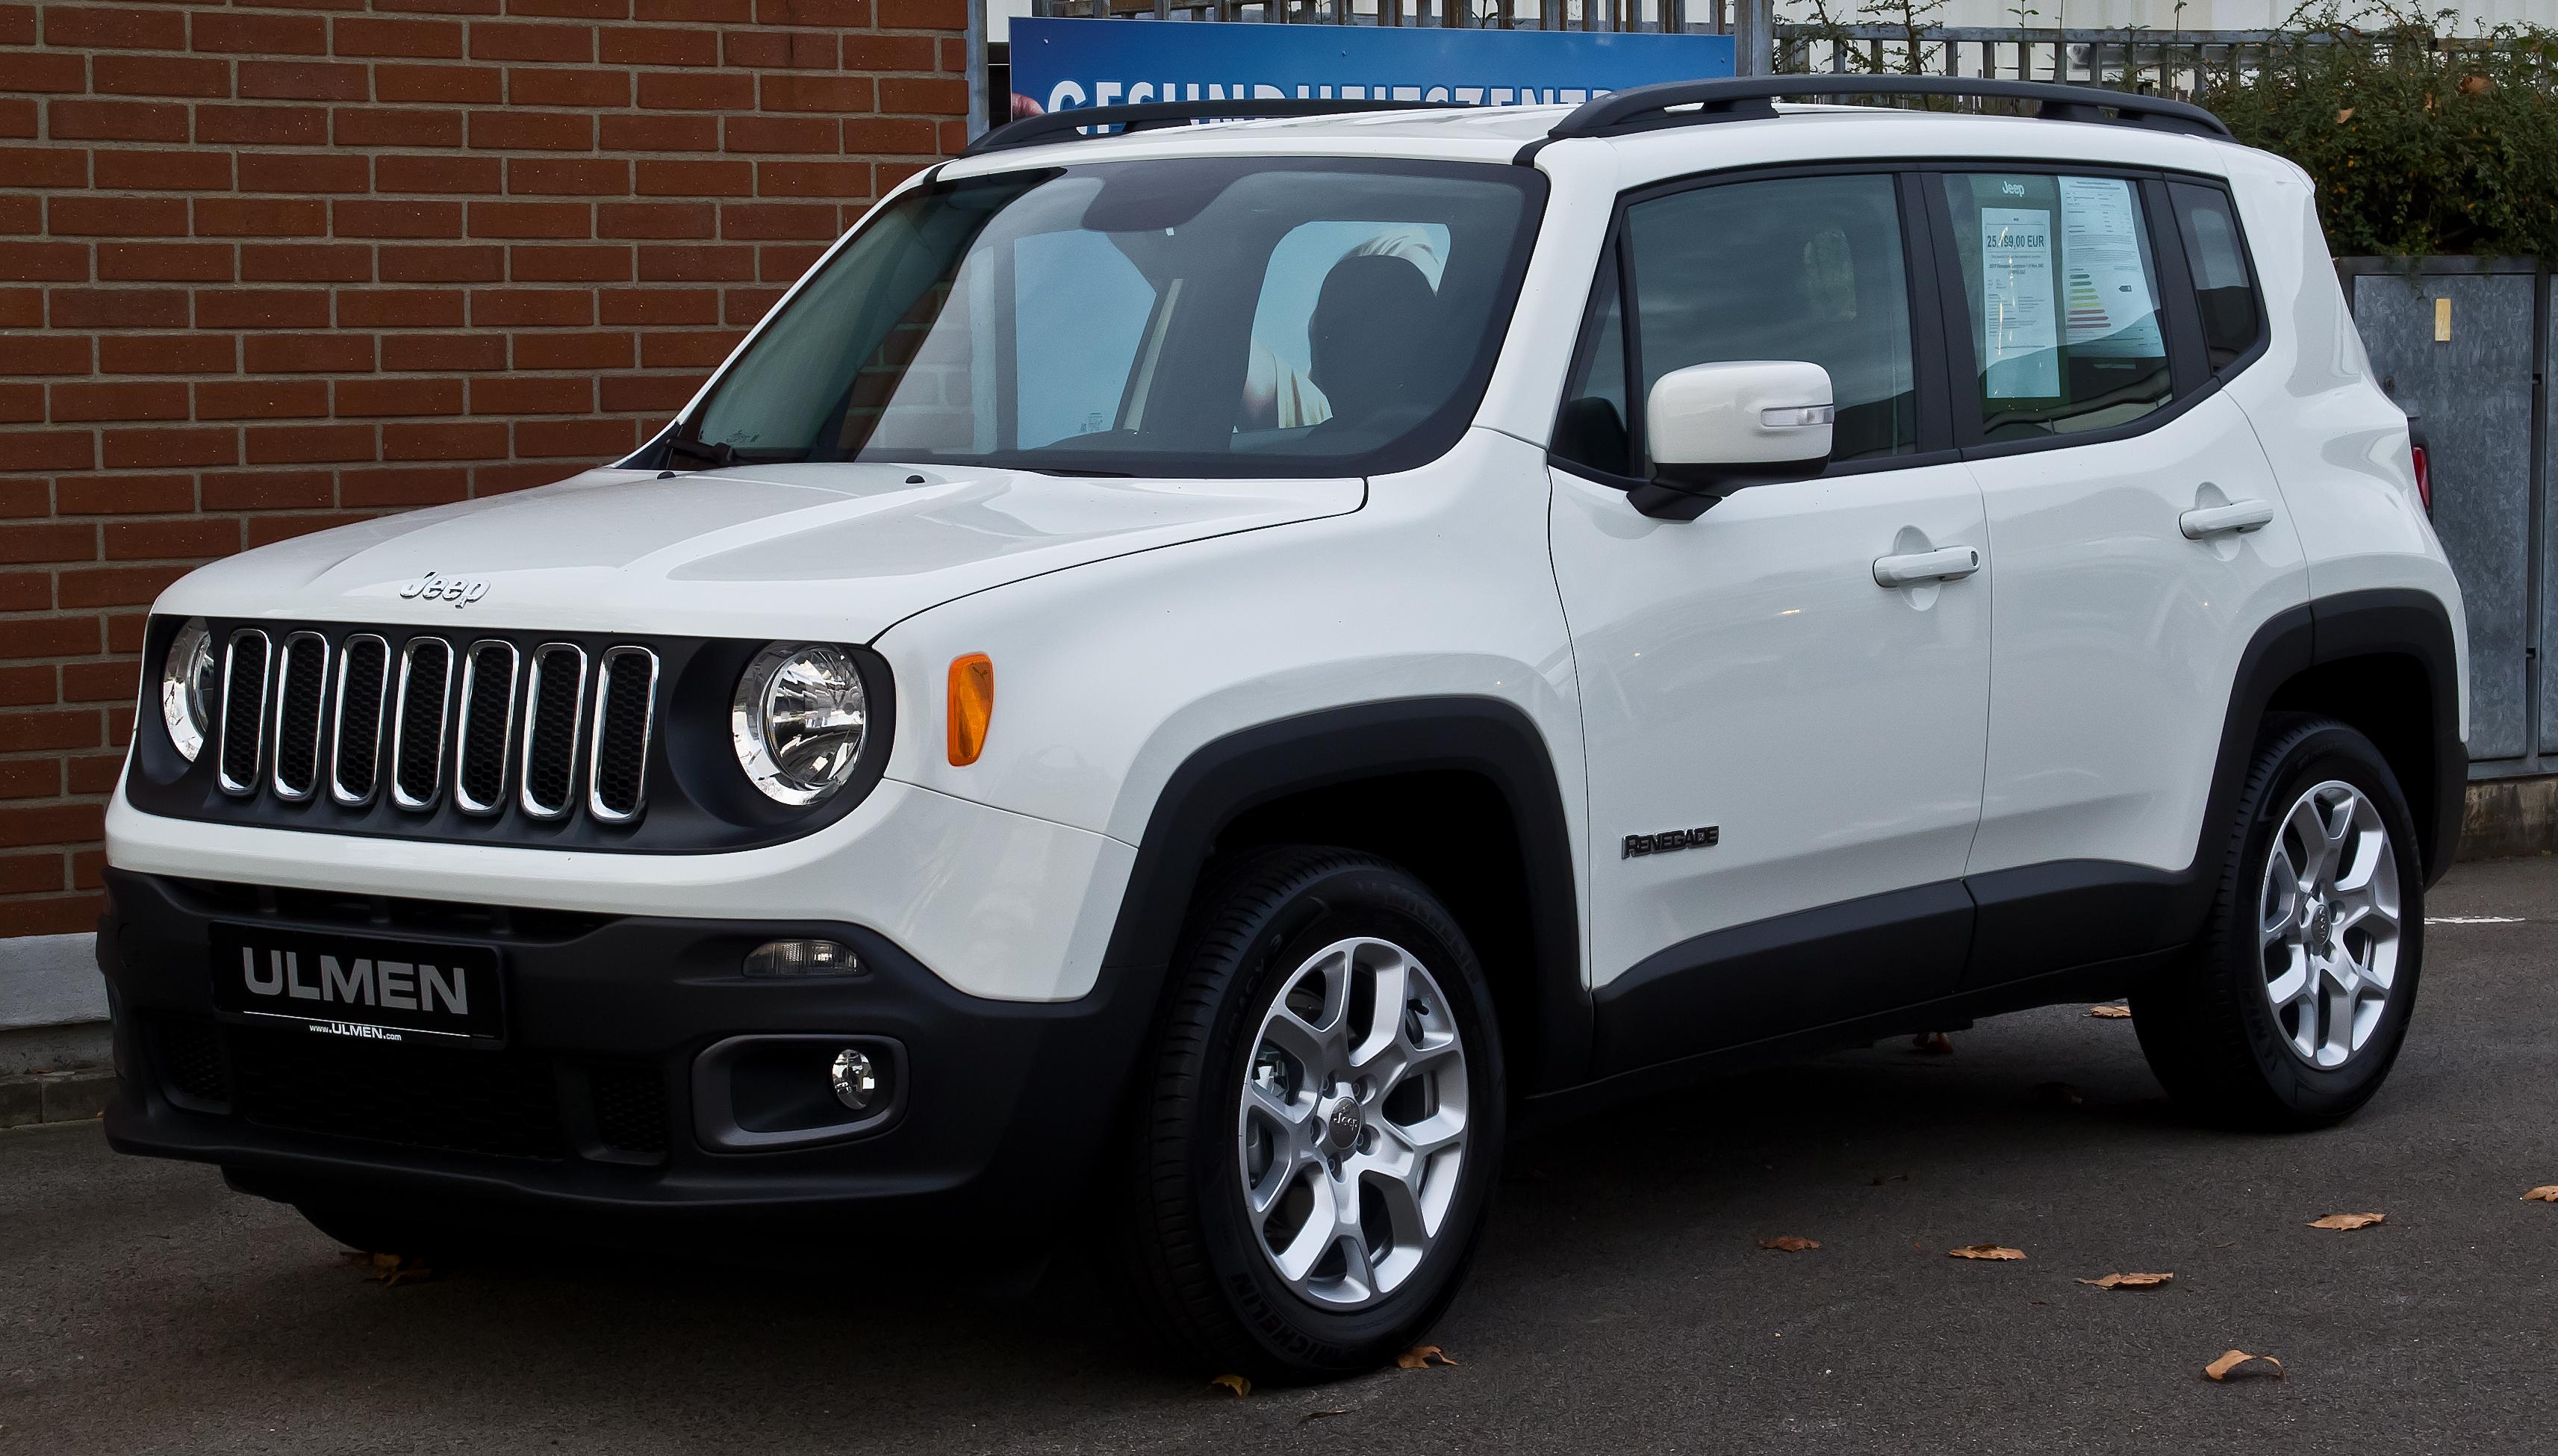 Jeep Renegade Trailhawk For Sale >> File:Jeep Renegade 1.6 MultiJet 2WD Longitude ...